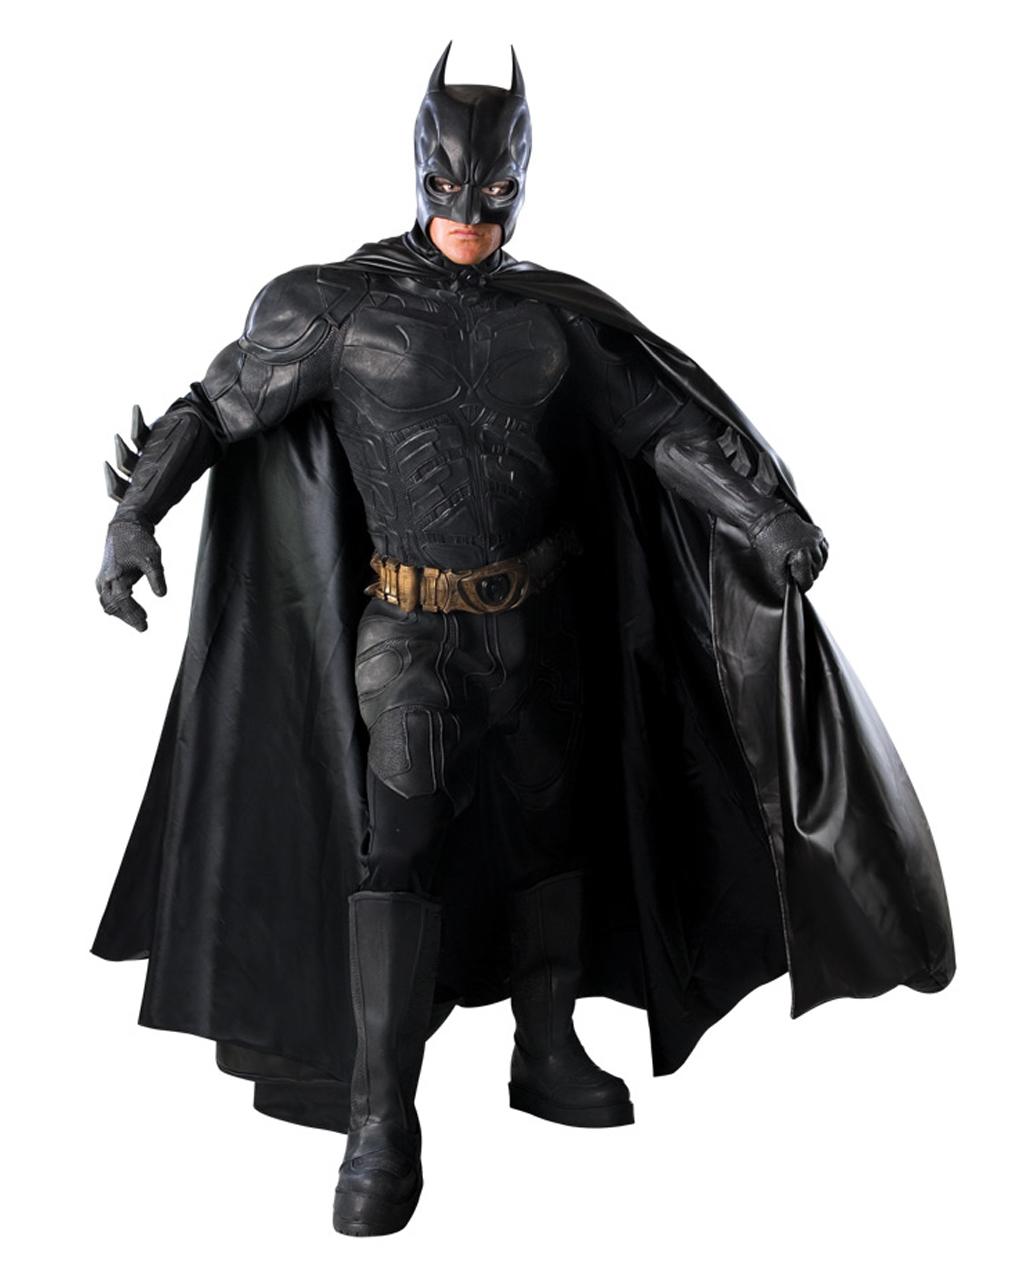 Batman Kostüm Deluxe 12-teilig Superhelden Kostüm | Horror-Shop.com